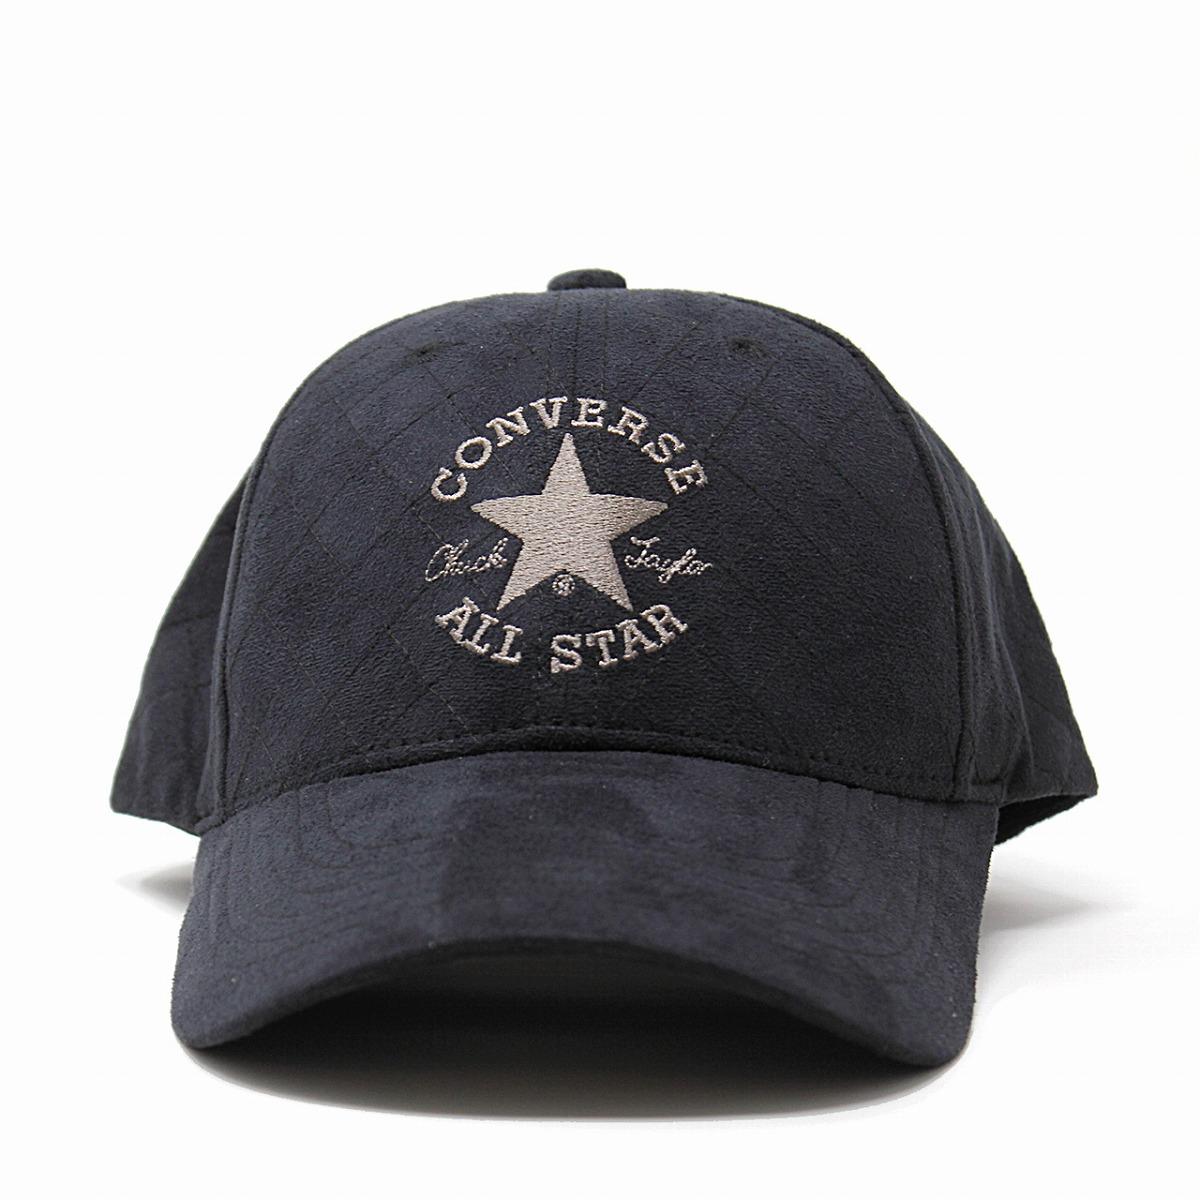 84c49aae8c5c Entering cap Converse all-stars suede cloth CONVERSE ALL STAR 6 one  quilting cap cold protection Shin pull hat logo men gap Dis  cap  black  black (Christmas ...